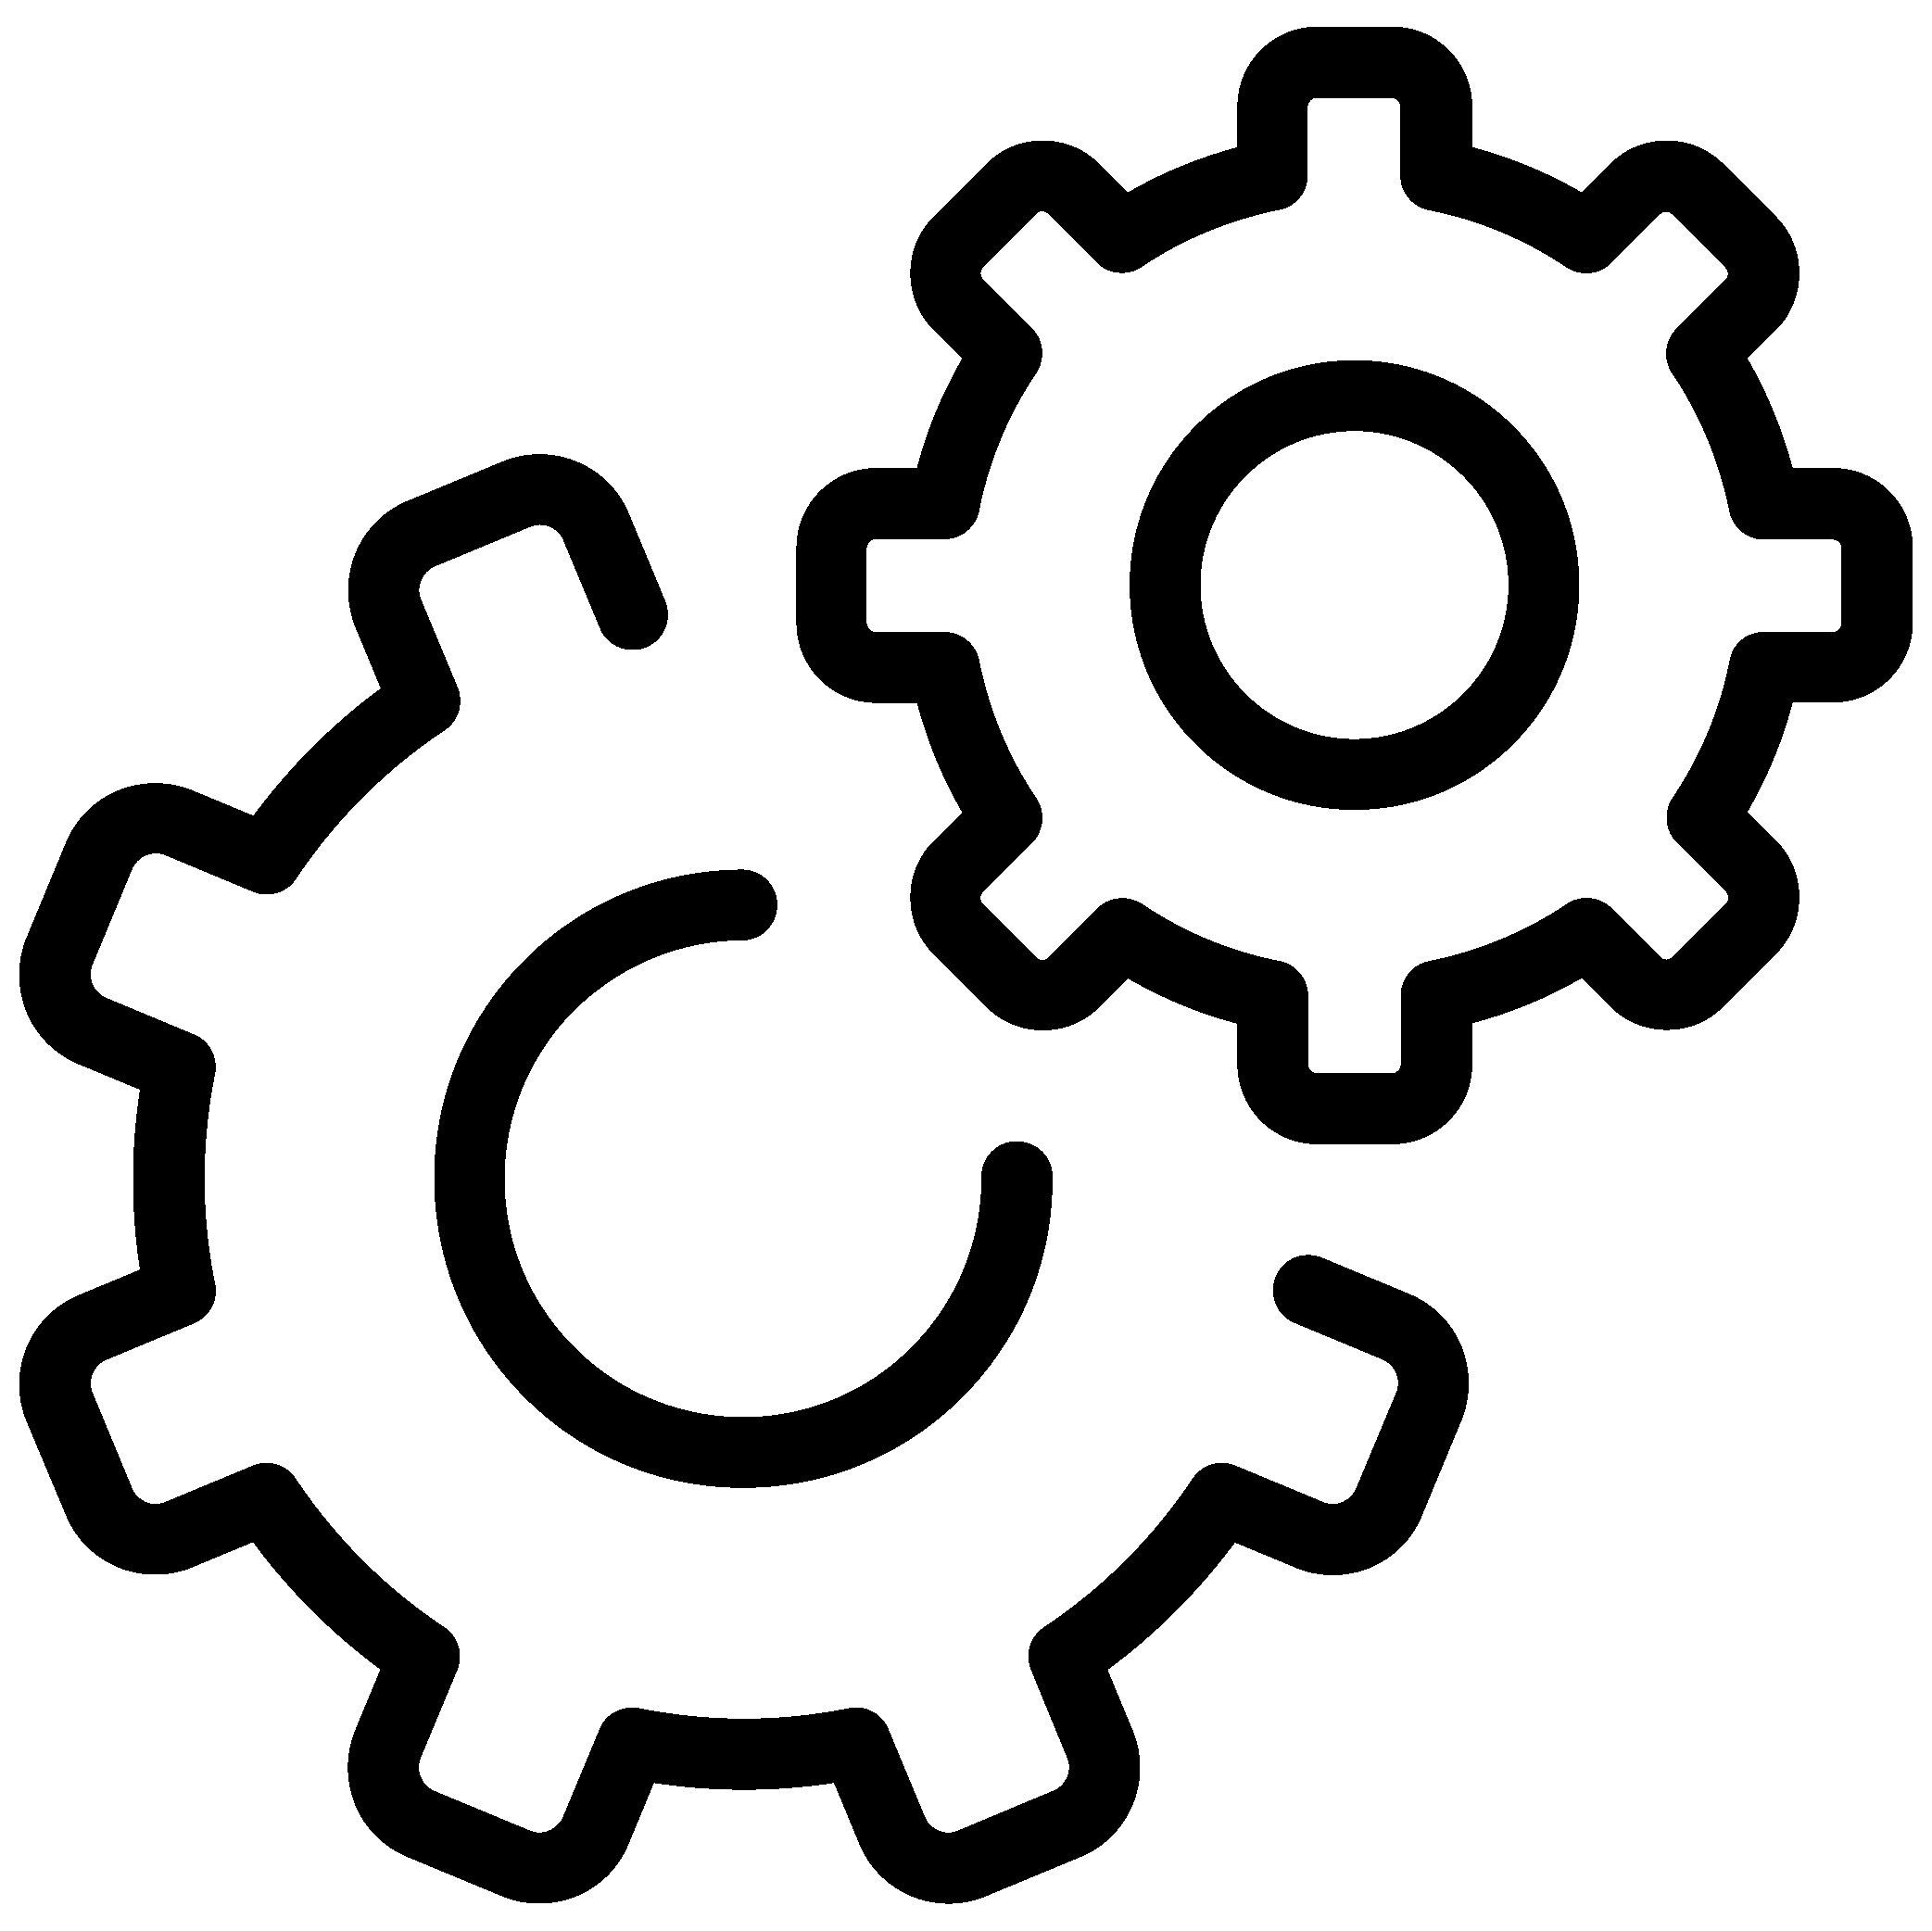 https://s3.amazonaws.com/cdn.freshdesk.com/data/helpdesk/attachments/production/60001910997/original/4ItdBwPRoqMC0k0PQbIbersxpWQyHHzl6Q.jpeg?1582210937